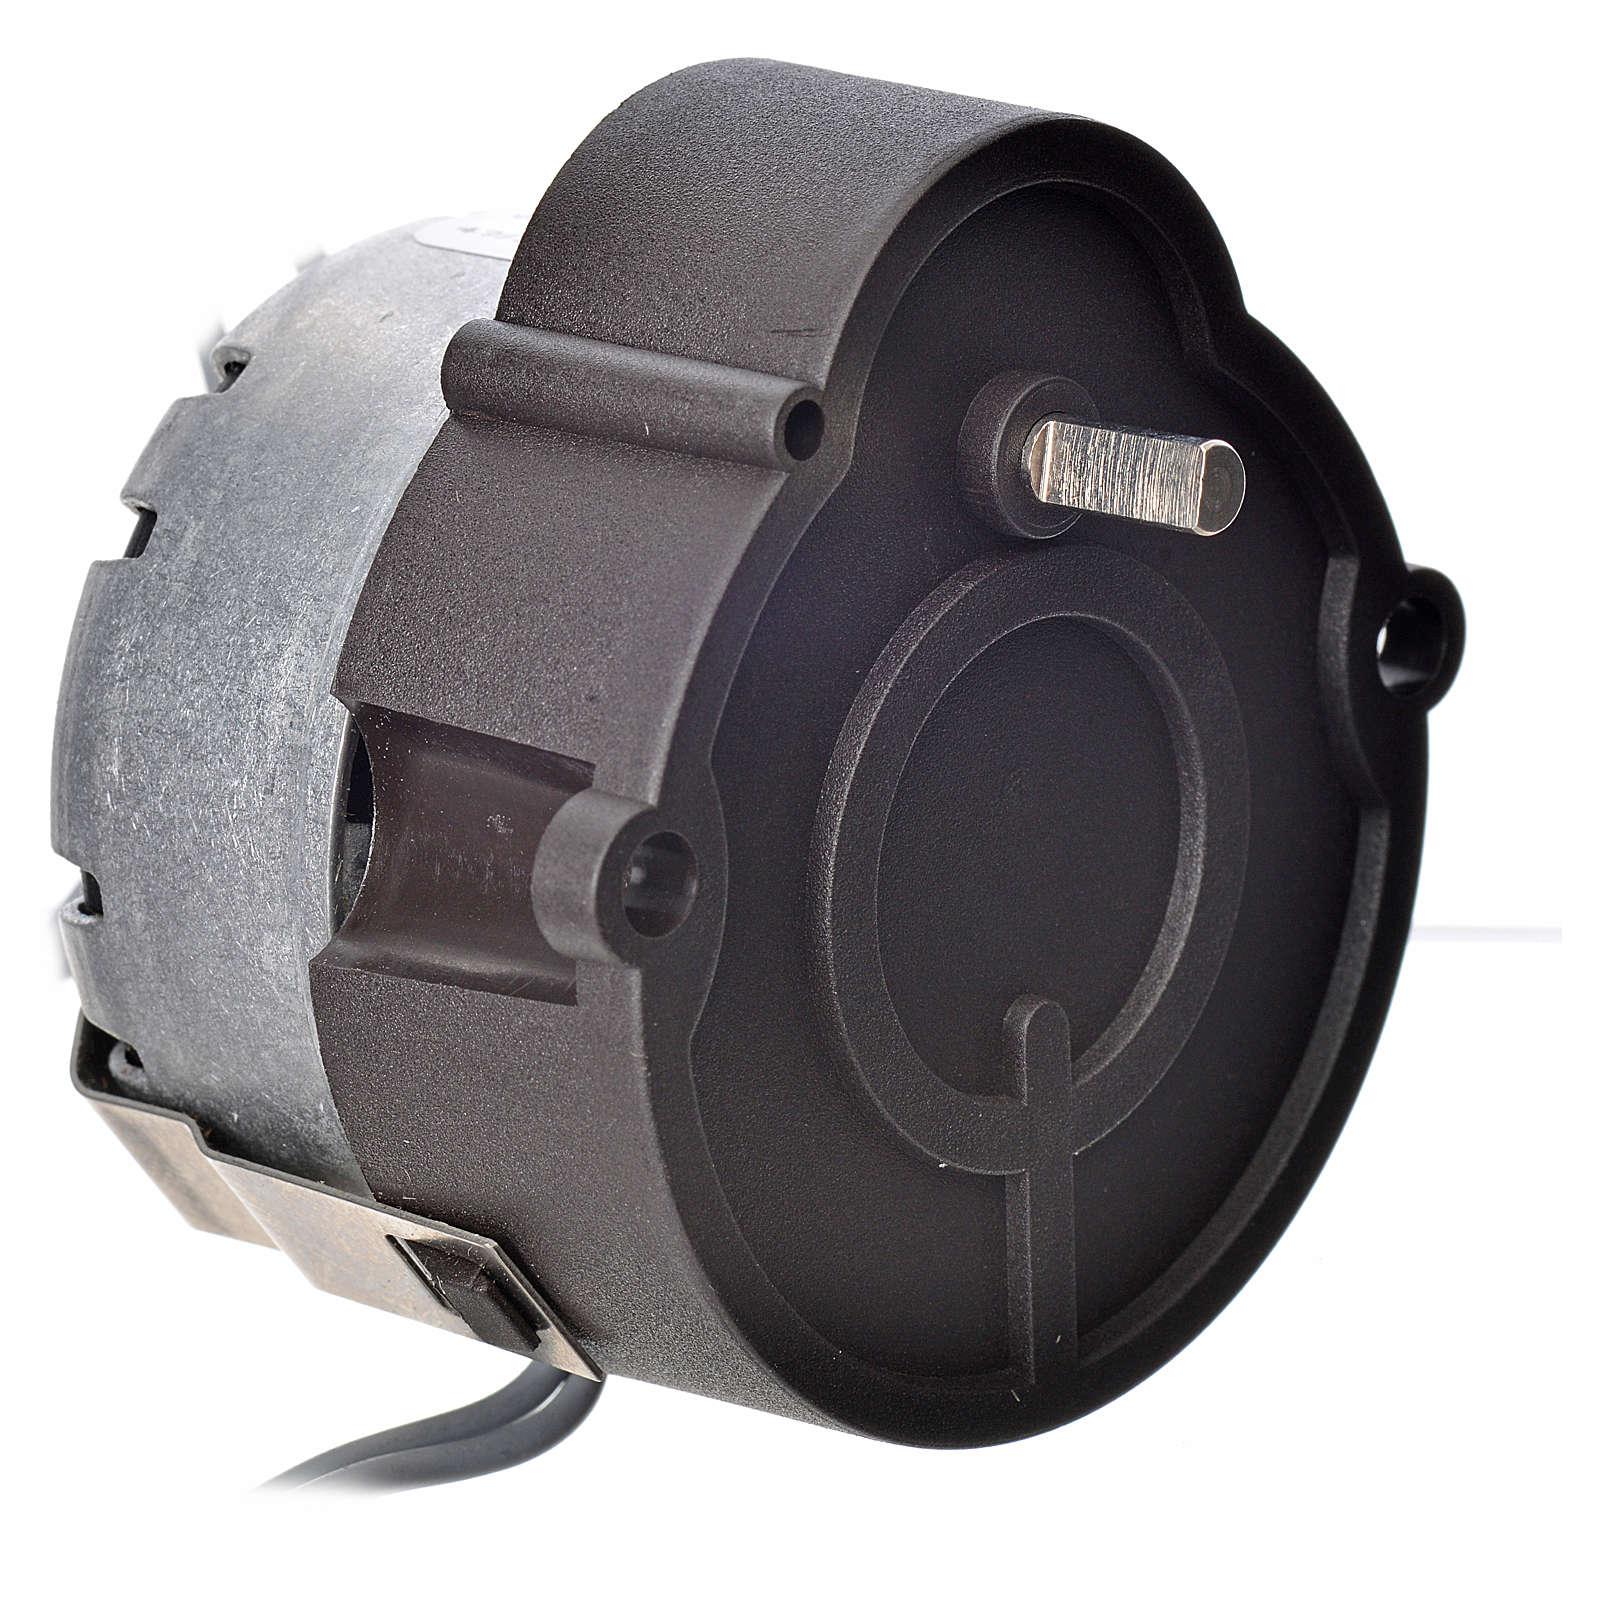 Motoriduttore presepe  MR giri/minuto 10 4